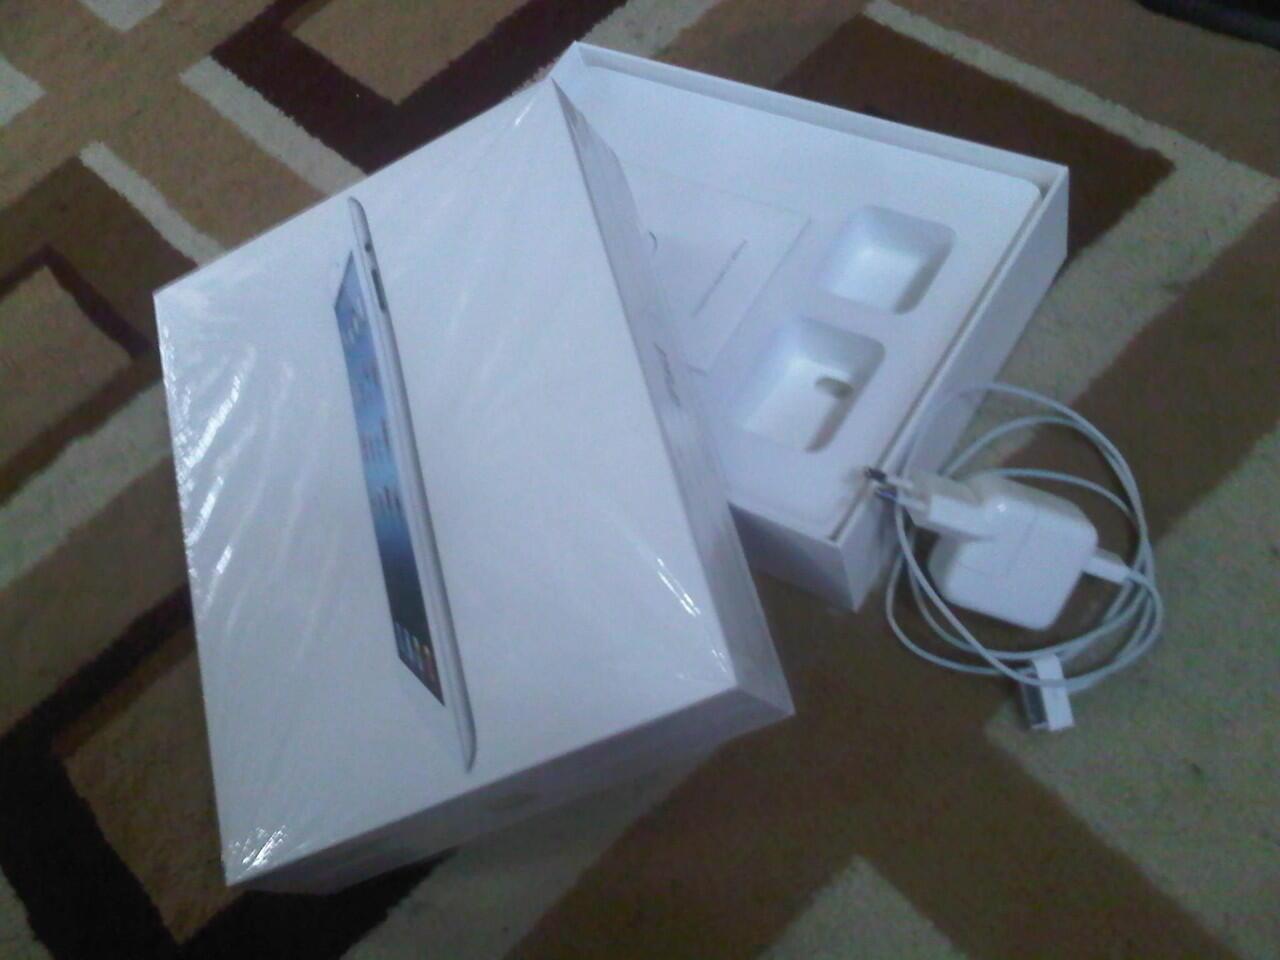 (WTS) New iPad / iPad 3 White 16GB WiFi